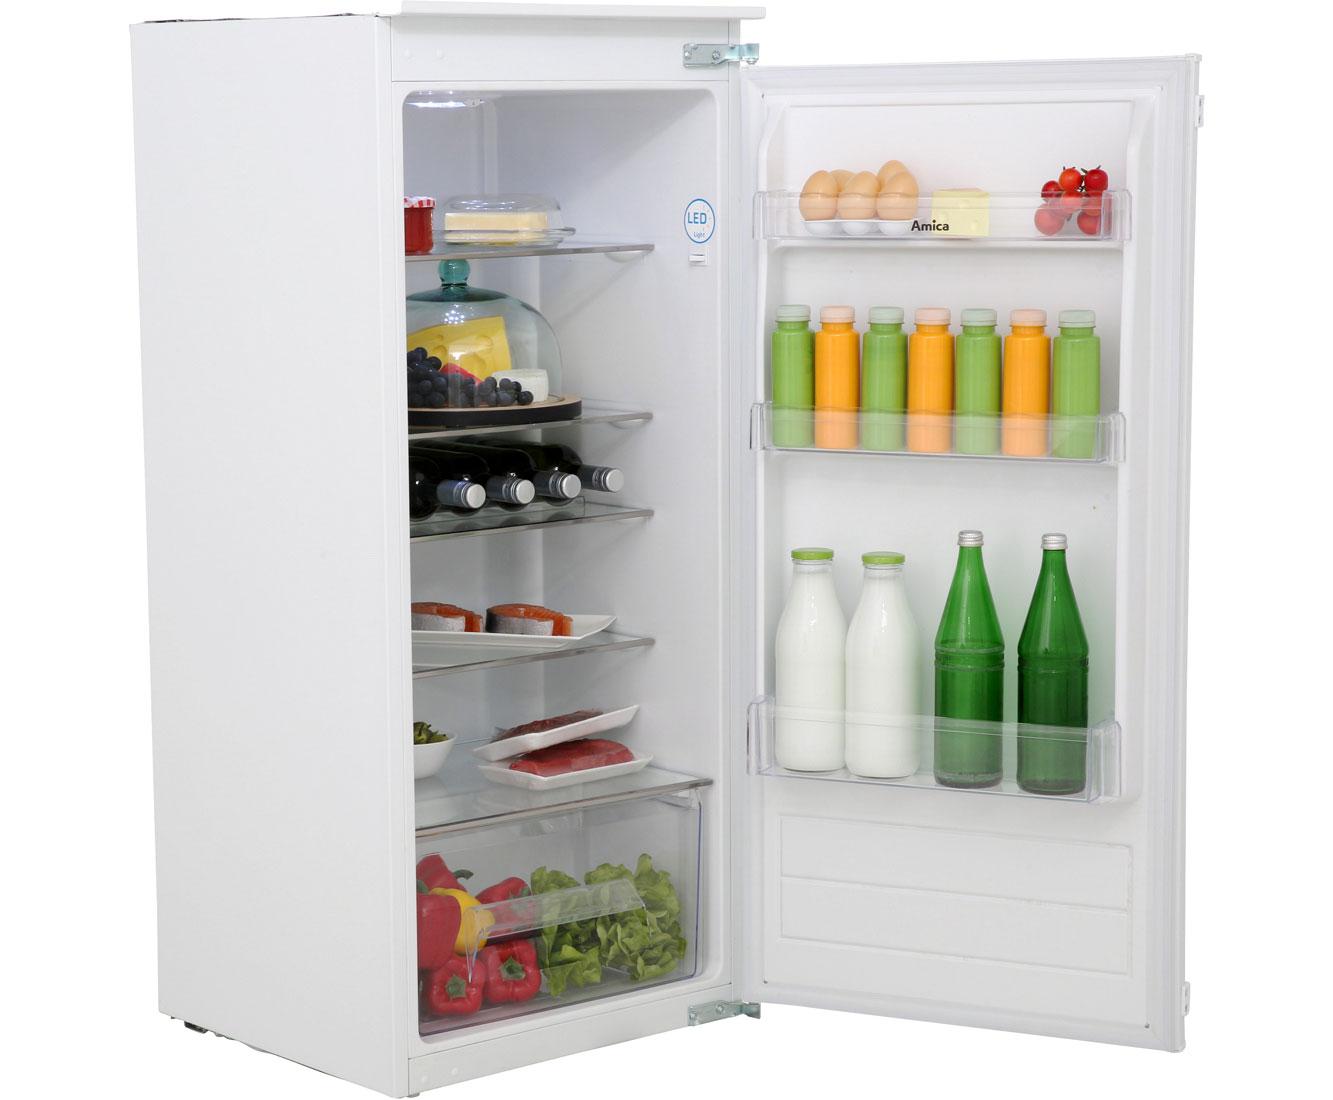 Amica Kühlschrank 50 Cm Breit : Kühlschrank neu amica uks kühlschrank unterbau cm weiss